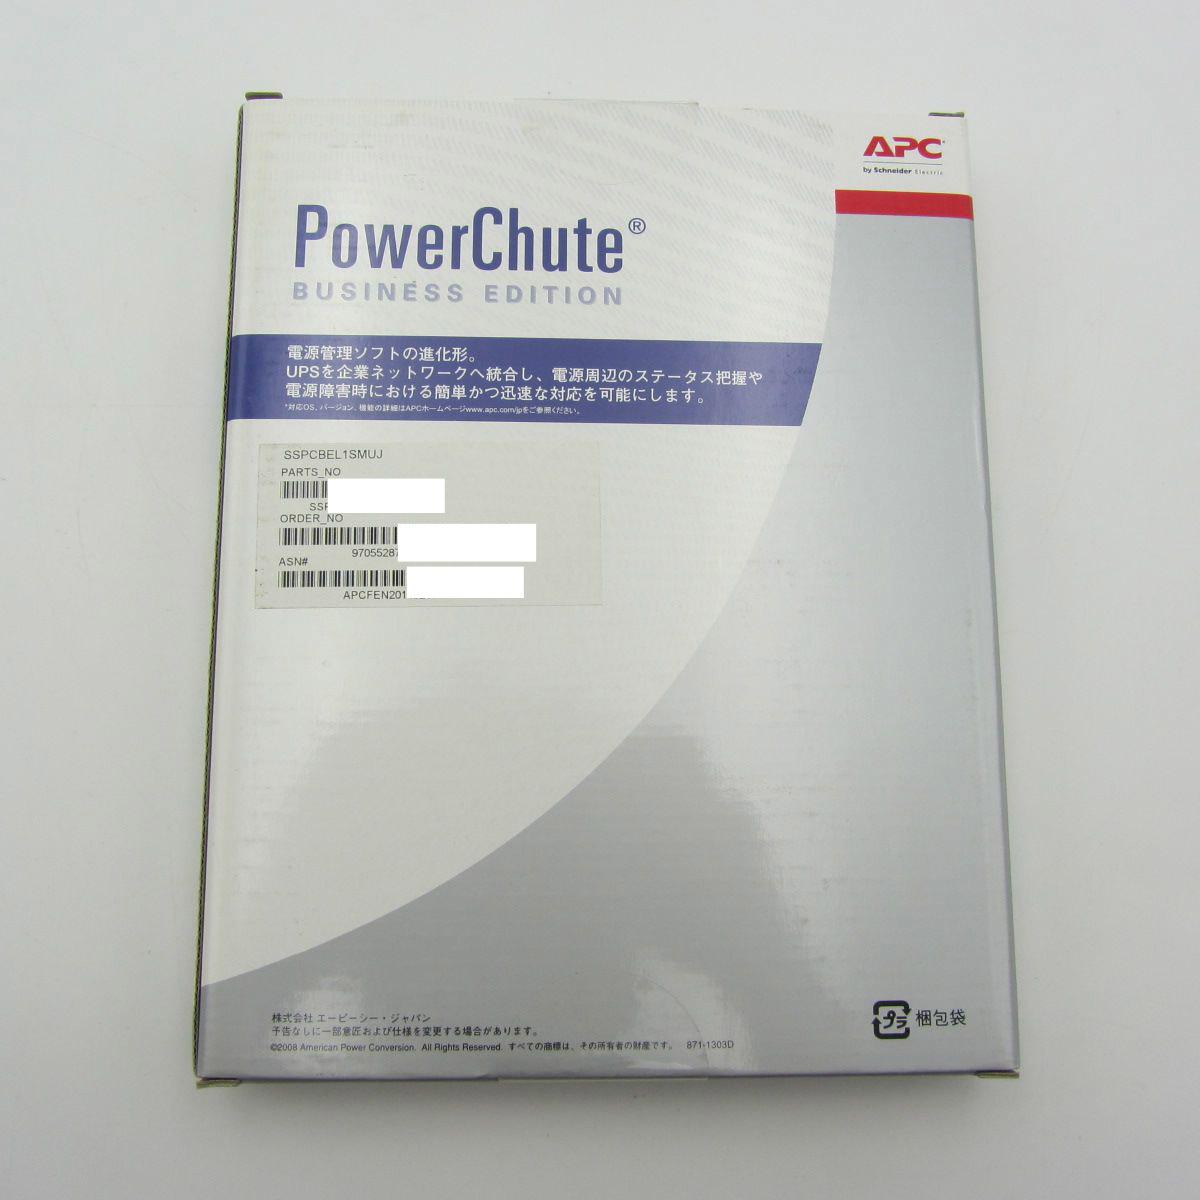 RS300●APC ダウンロード版 PowerChute Business Edition Deluxe for Linux Unix UPGL付  アップグレードライセンス付/sspcbel1smuj